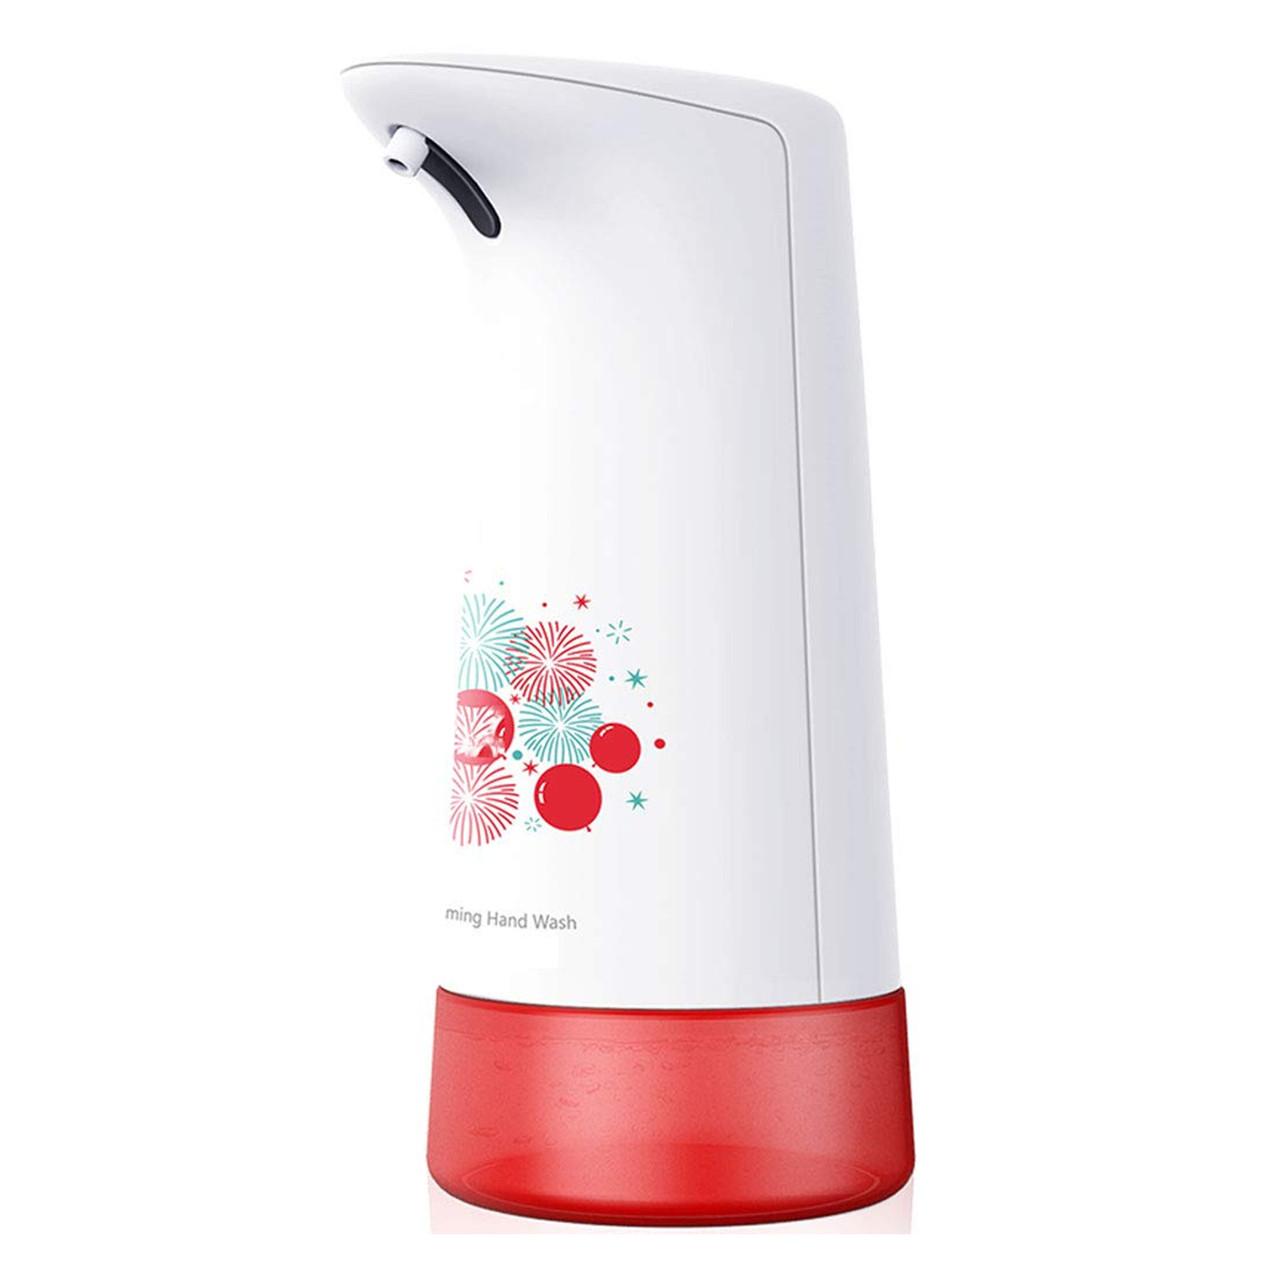 Сенсорная мыльница Xiaomi Mijia Xiaowei , White